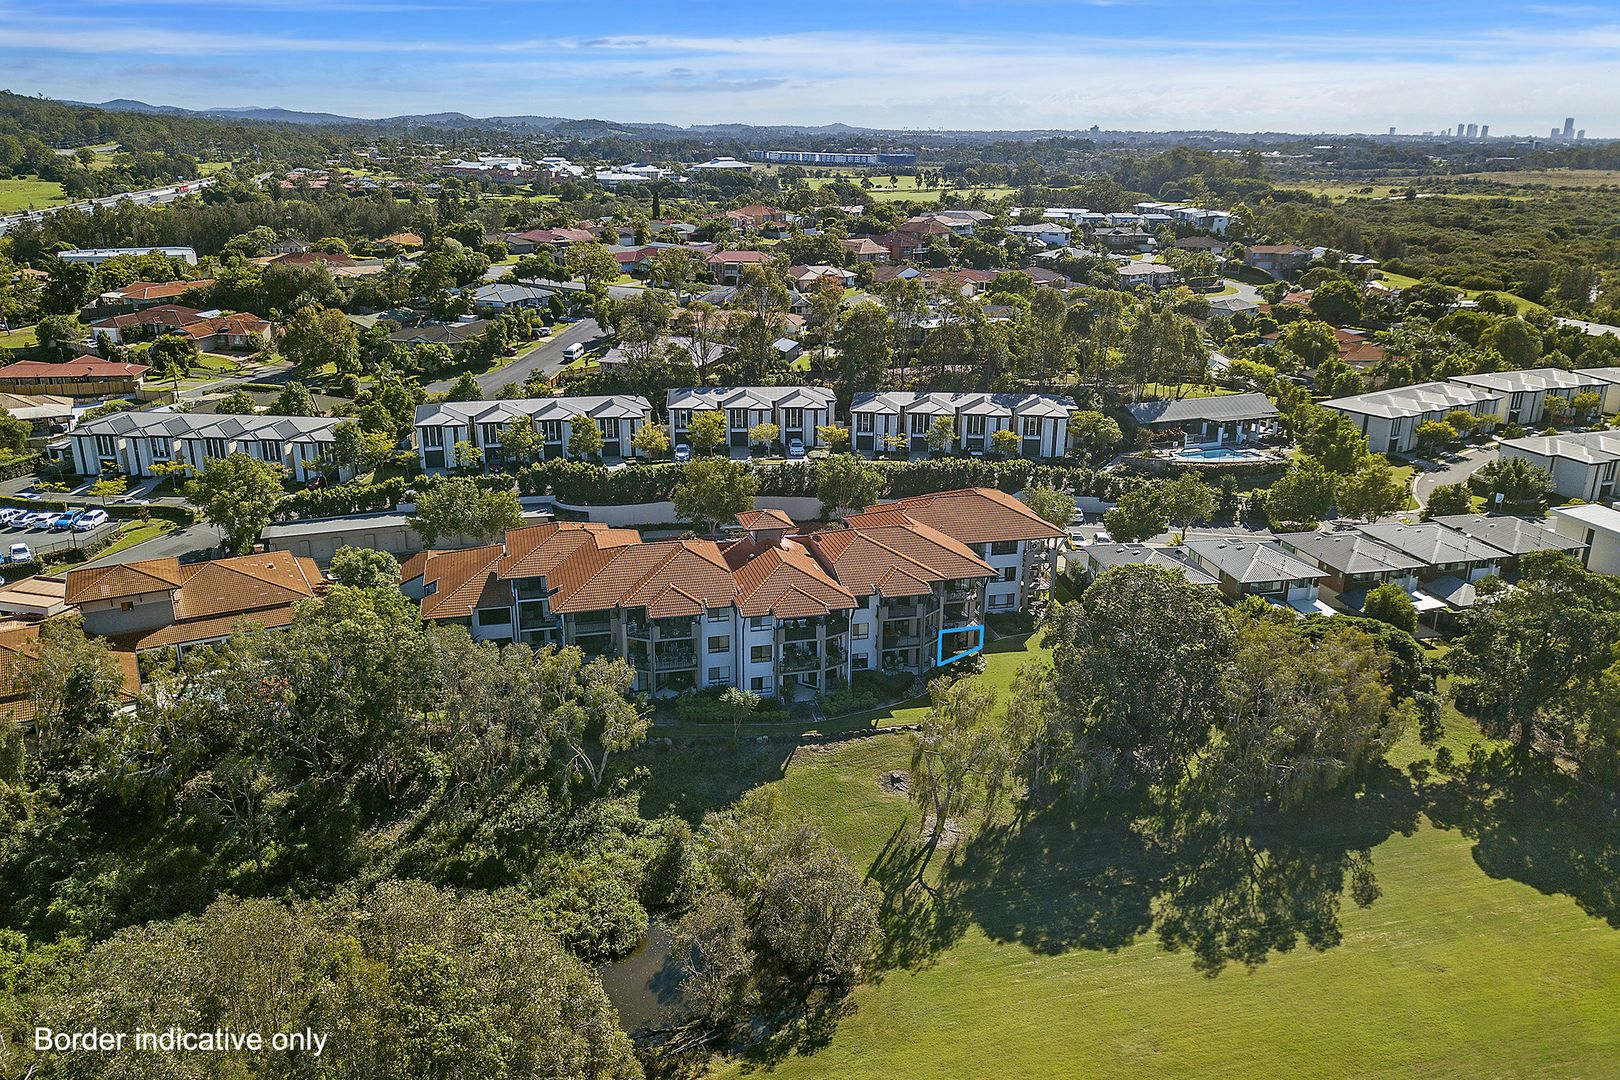 6/501 North Hill Drive, Robina QLD 4226, Image 1